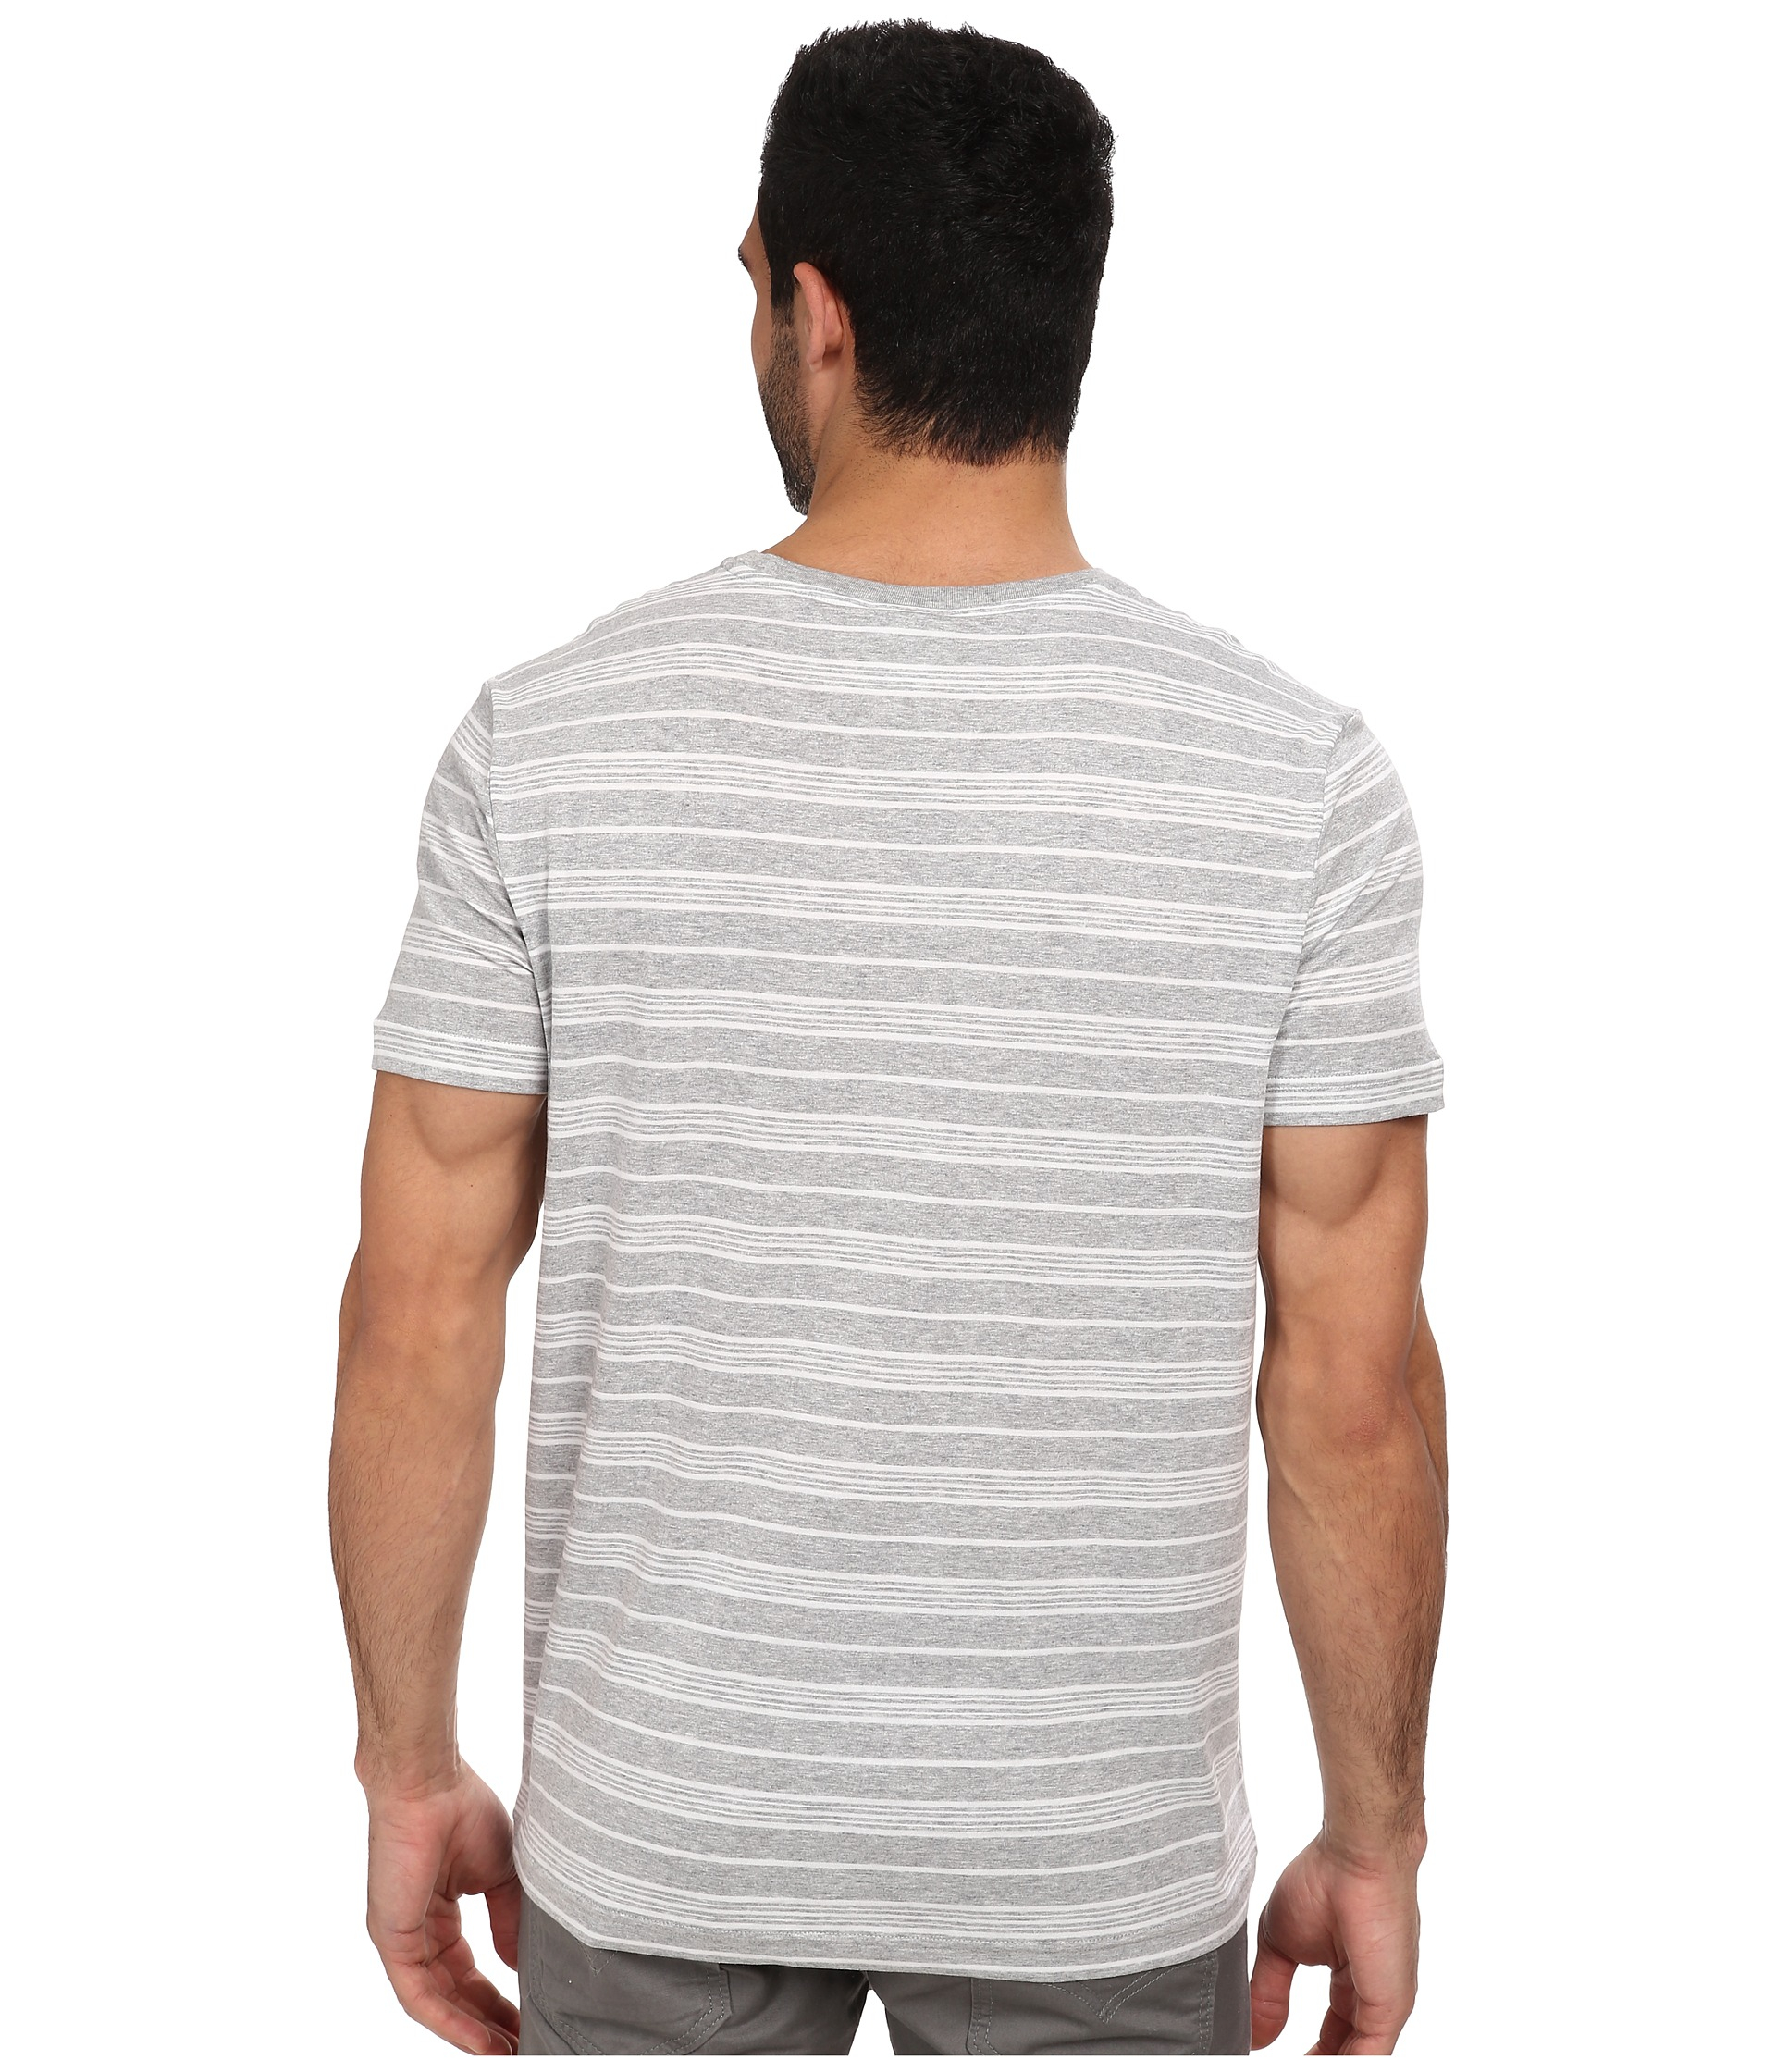 lyst lacoste jersey short sleeve v neck striped tee. Black Bedroom Furniture Sets. Home Design Ideas